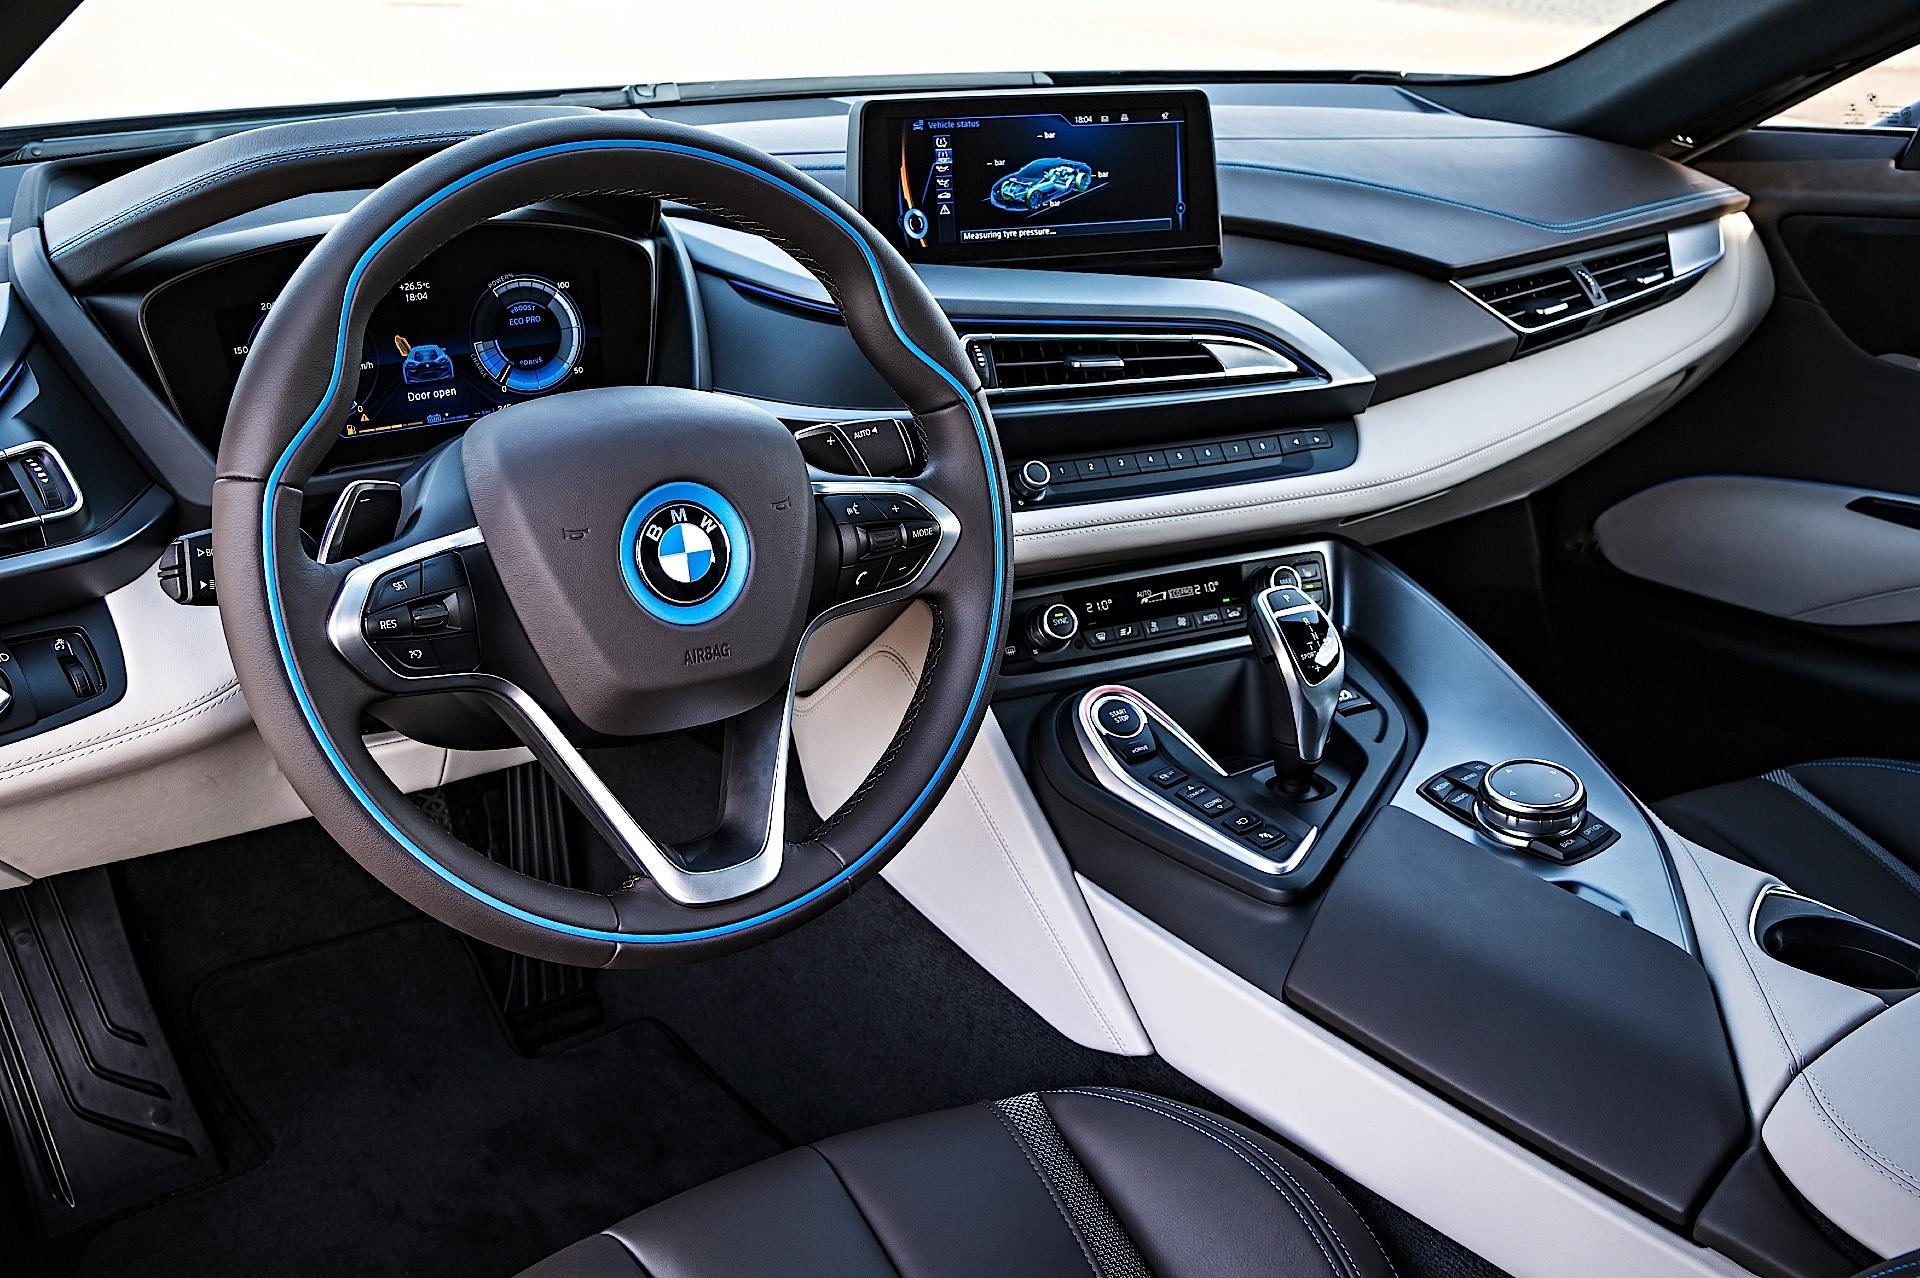 i8 bmw i12 autoevolution interior coupe specs inside auto interieur dashboard series gt